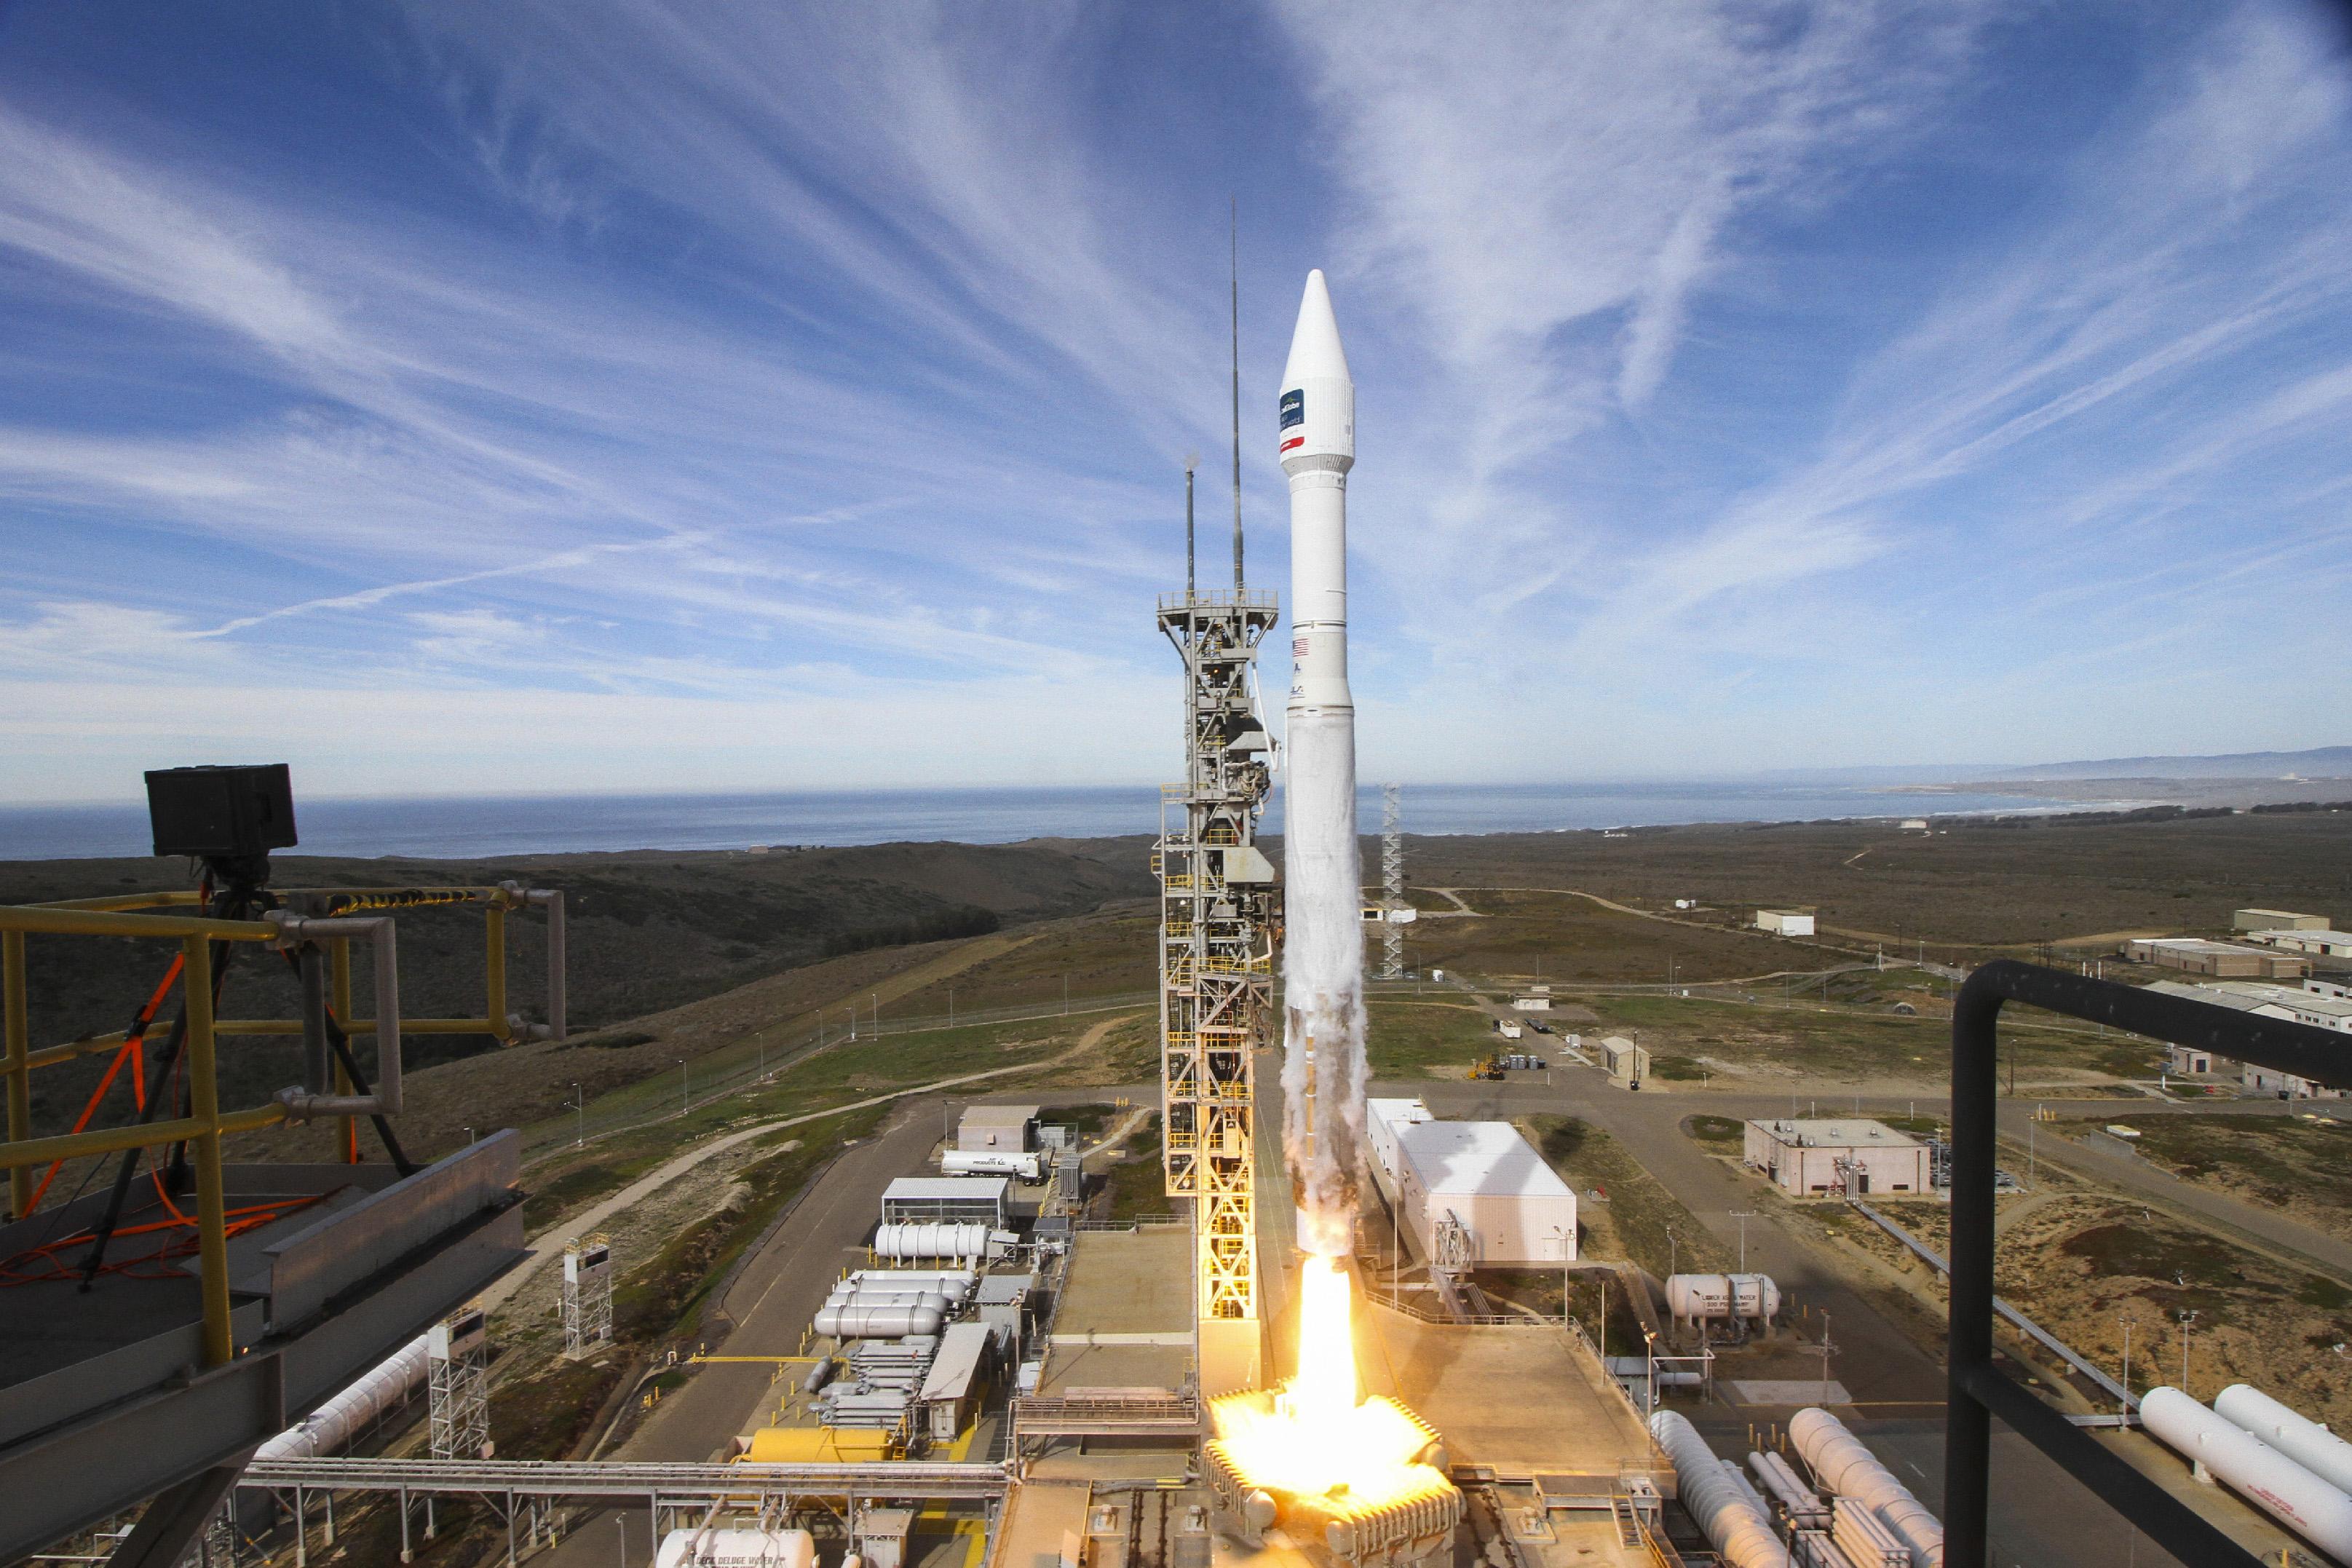 Launch Photos: Atlas V Rocket Soars with DigitalGlobe's WorldView-4 Satellite